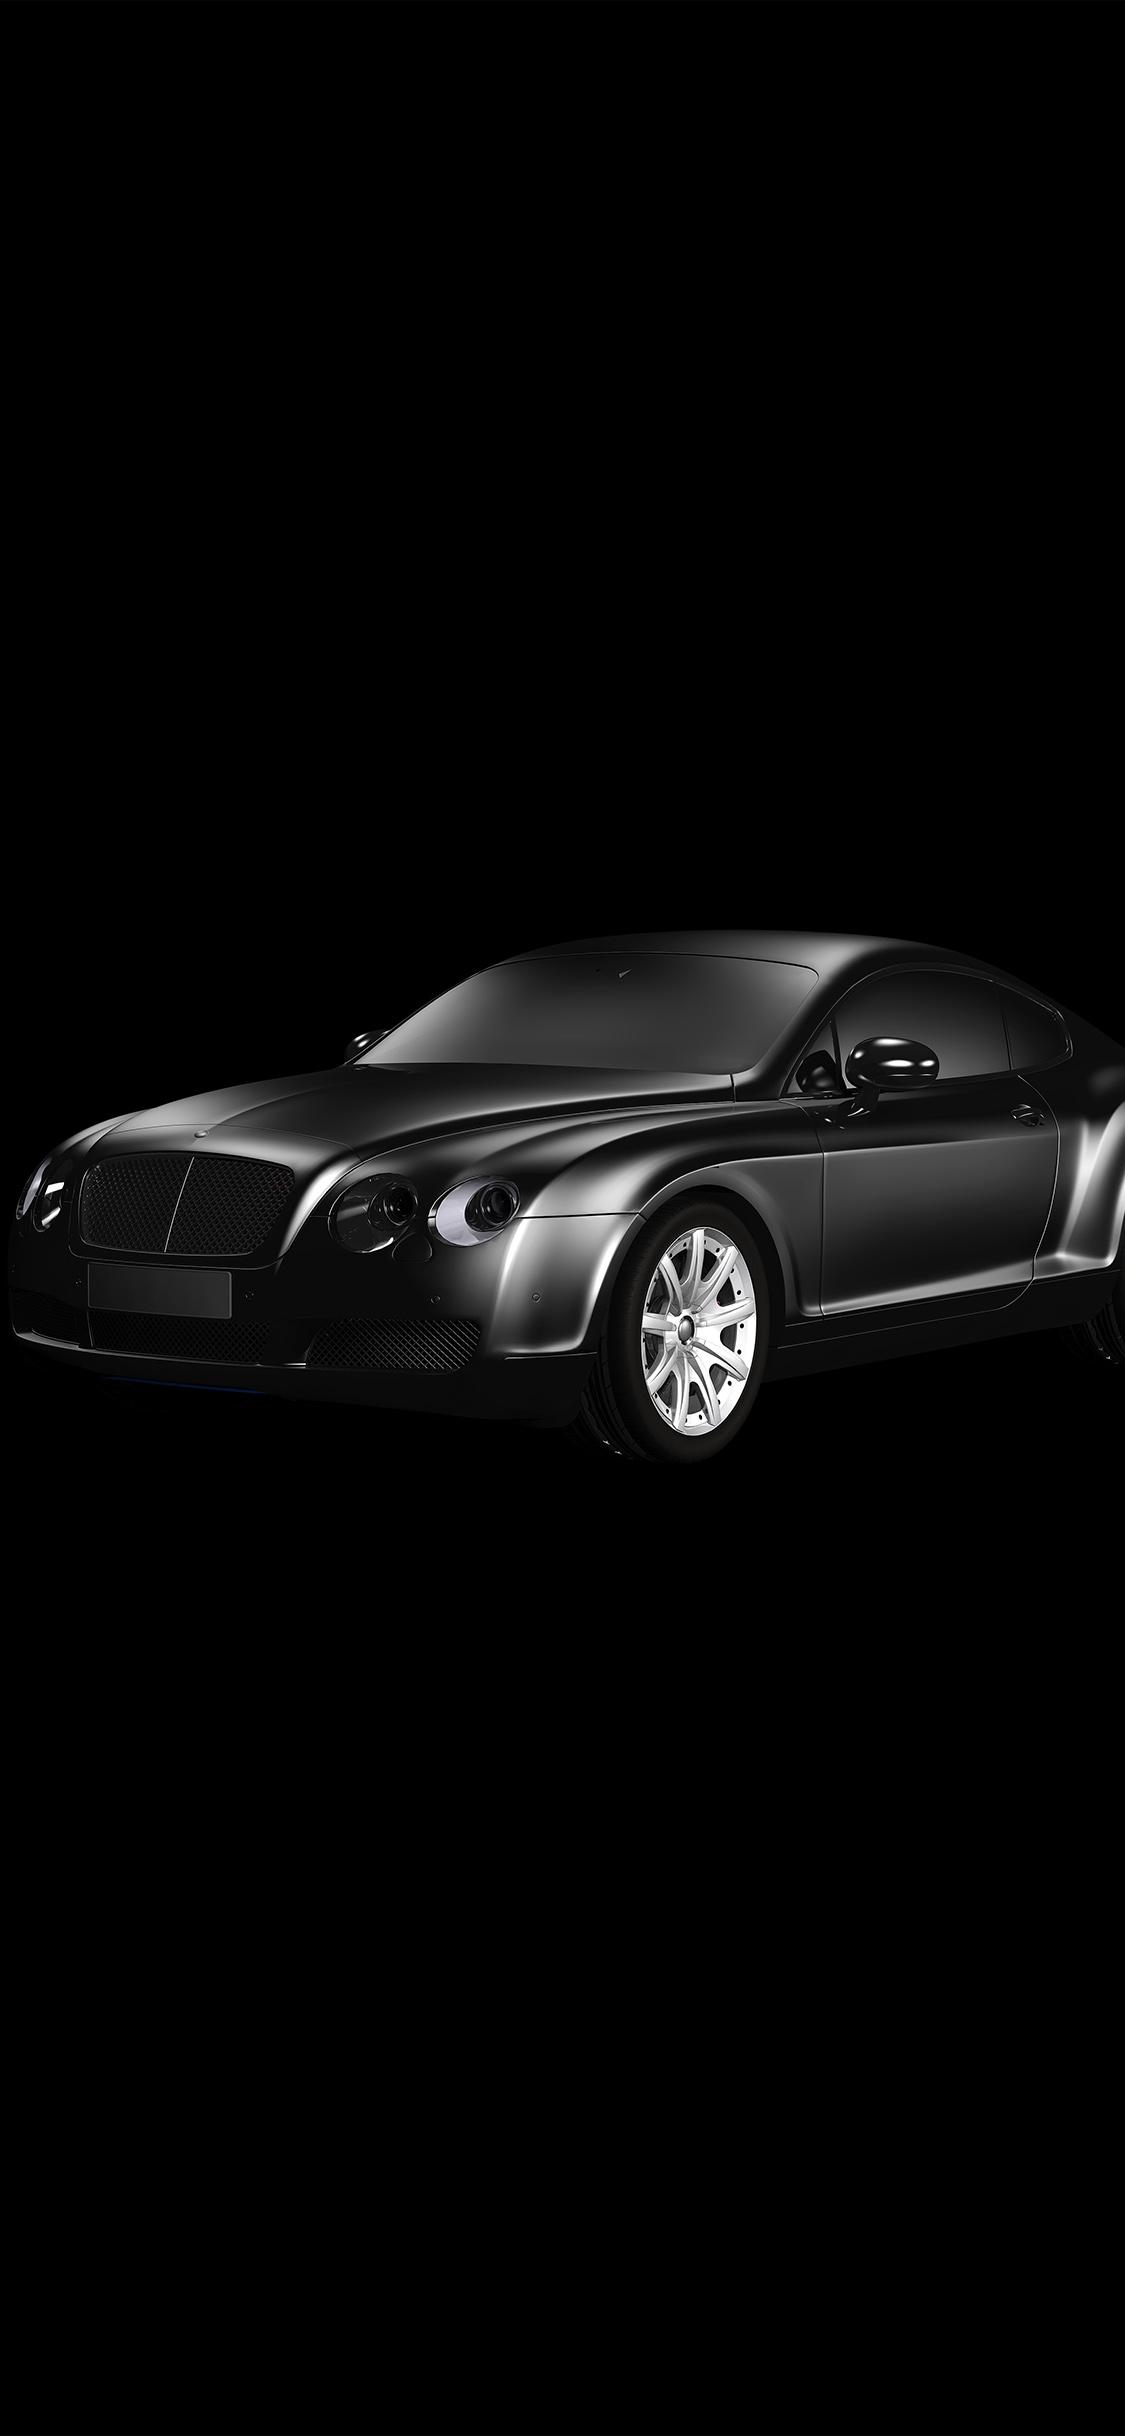 At00 Car Bentley Dark Black Limousine Art Illustration Wallpaper